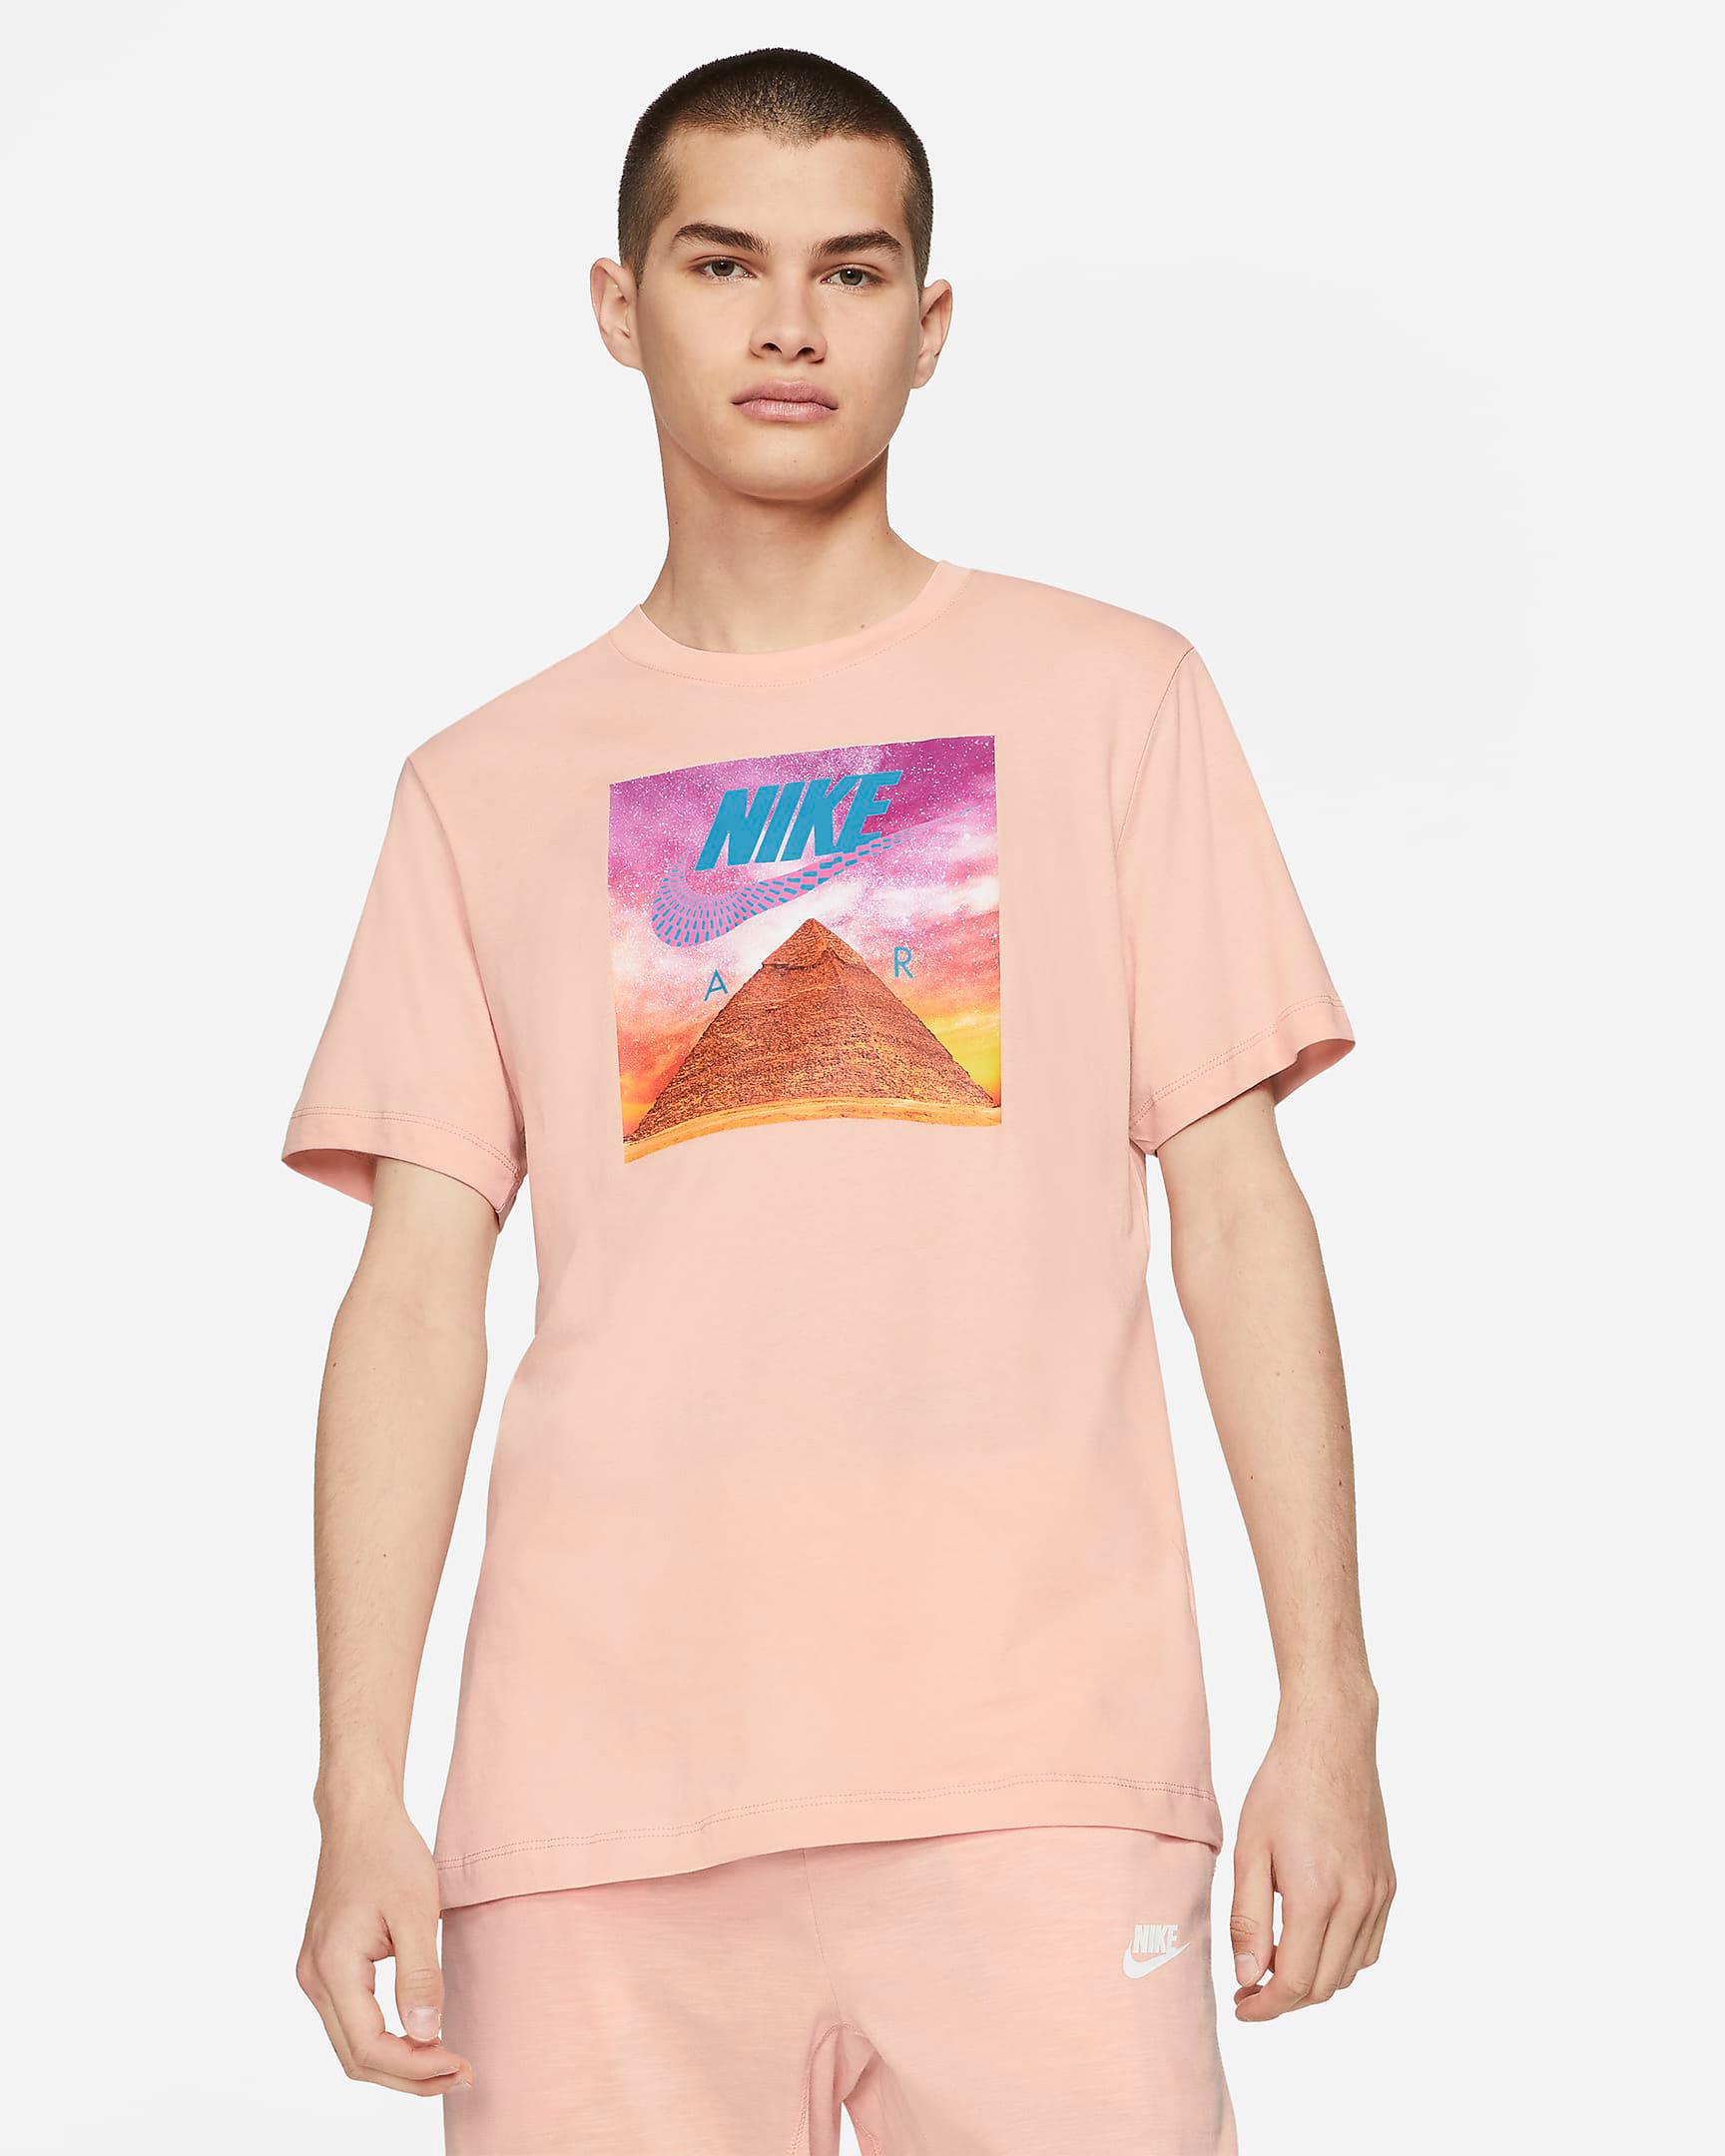 nike-arctic-orange-pyramid-t-shirt